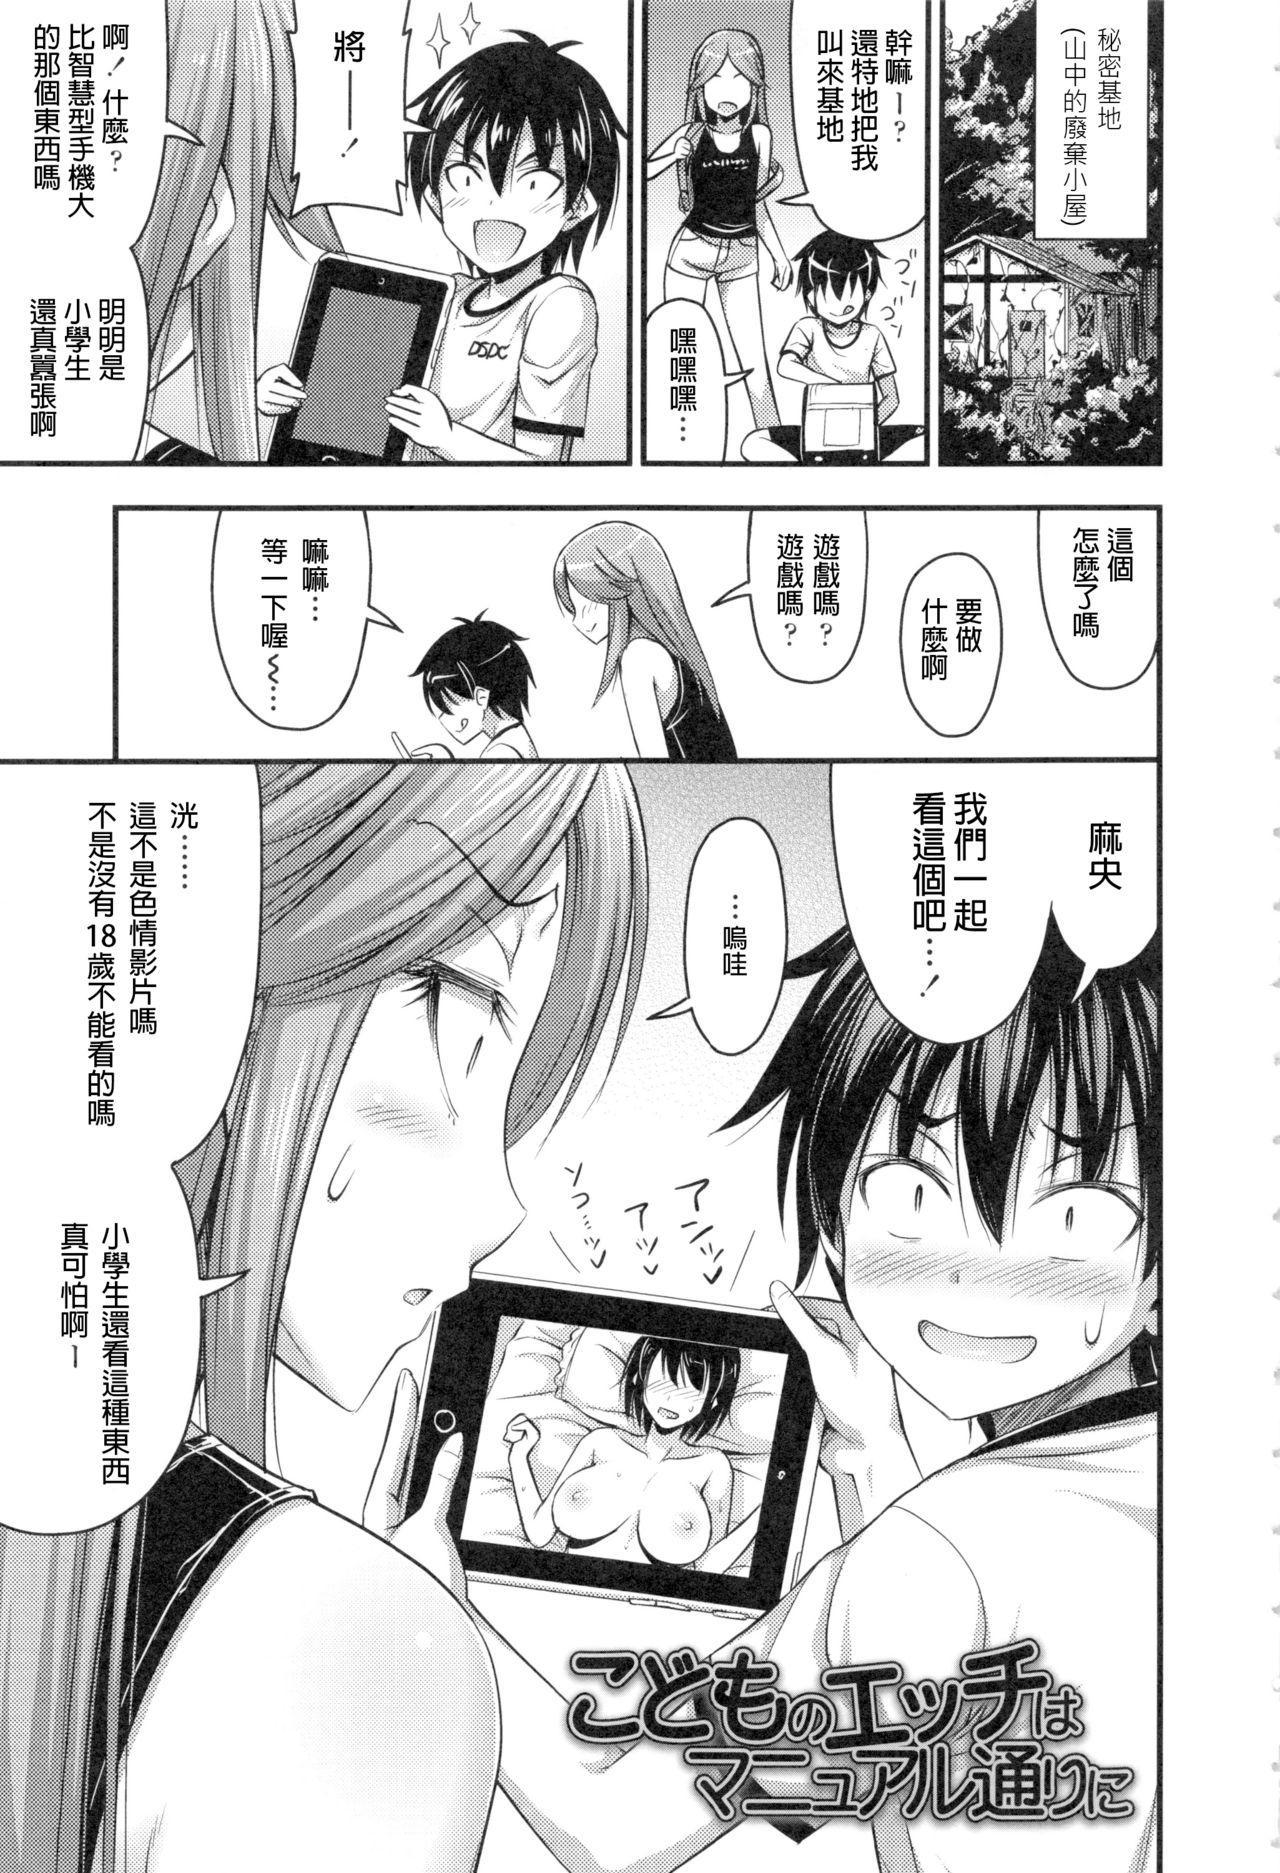 Onii-chan Sonna ni Short Pants Suki nano? 158